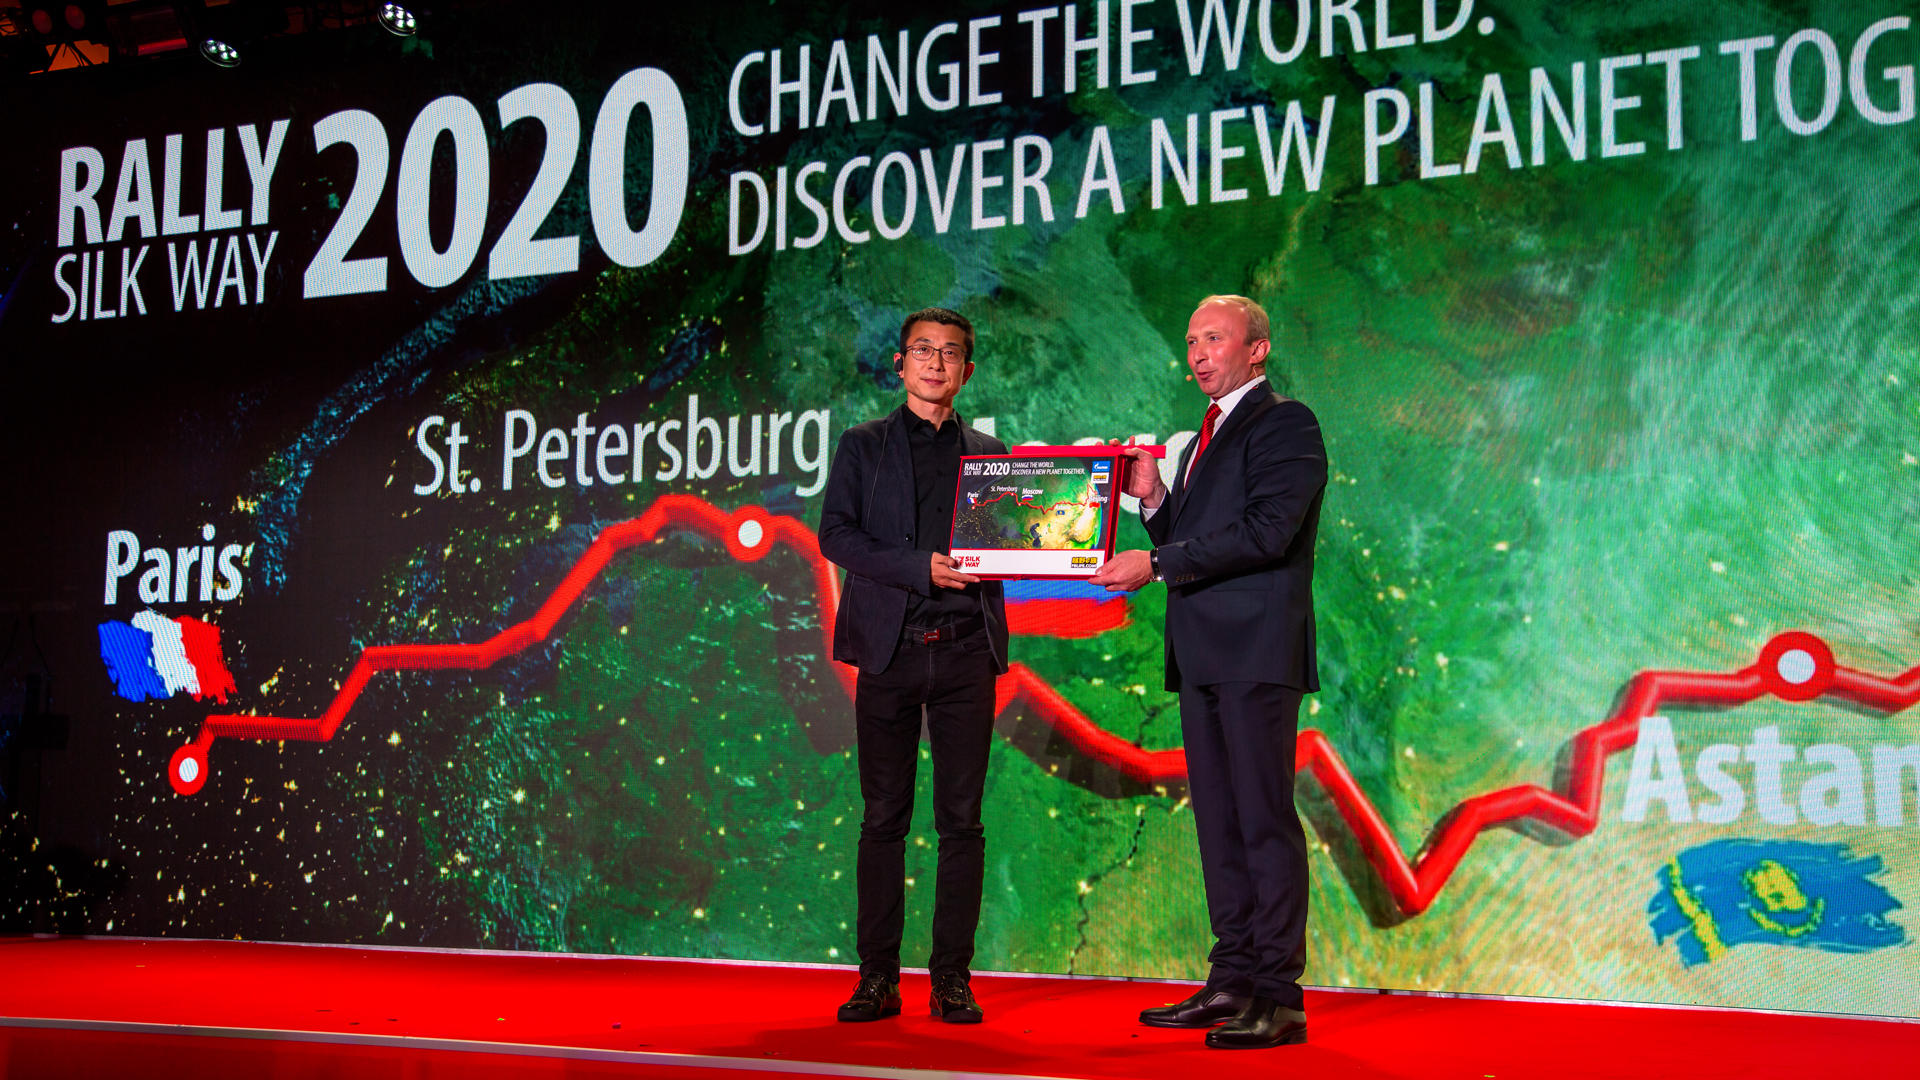 Презентован маршрут Silk Way 2018. Казахстана в нём нет